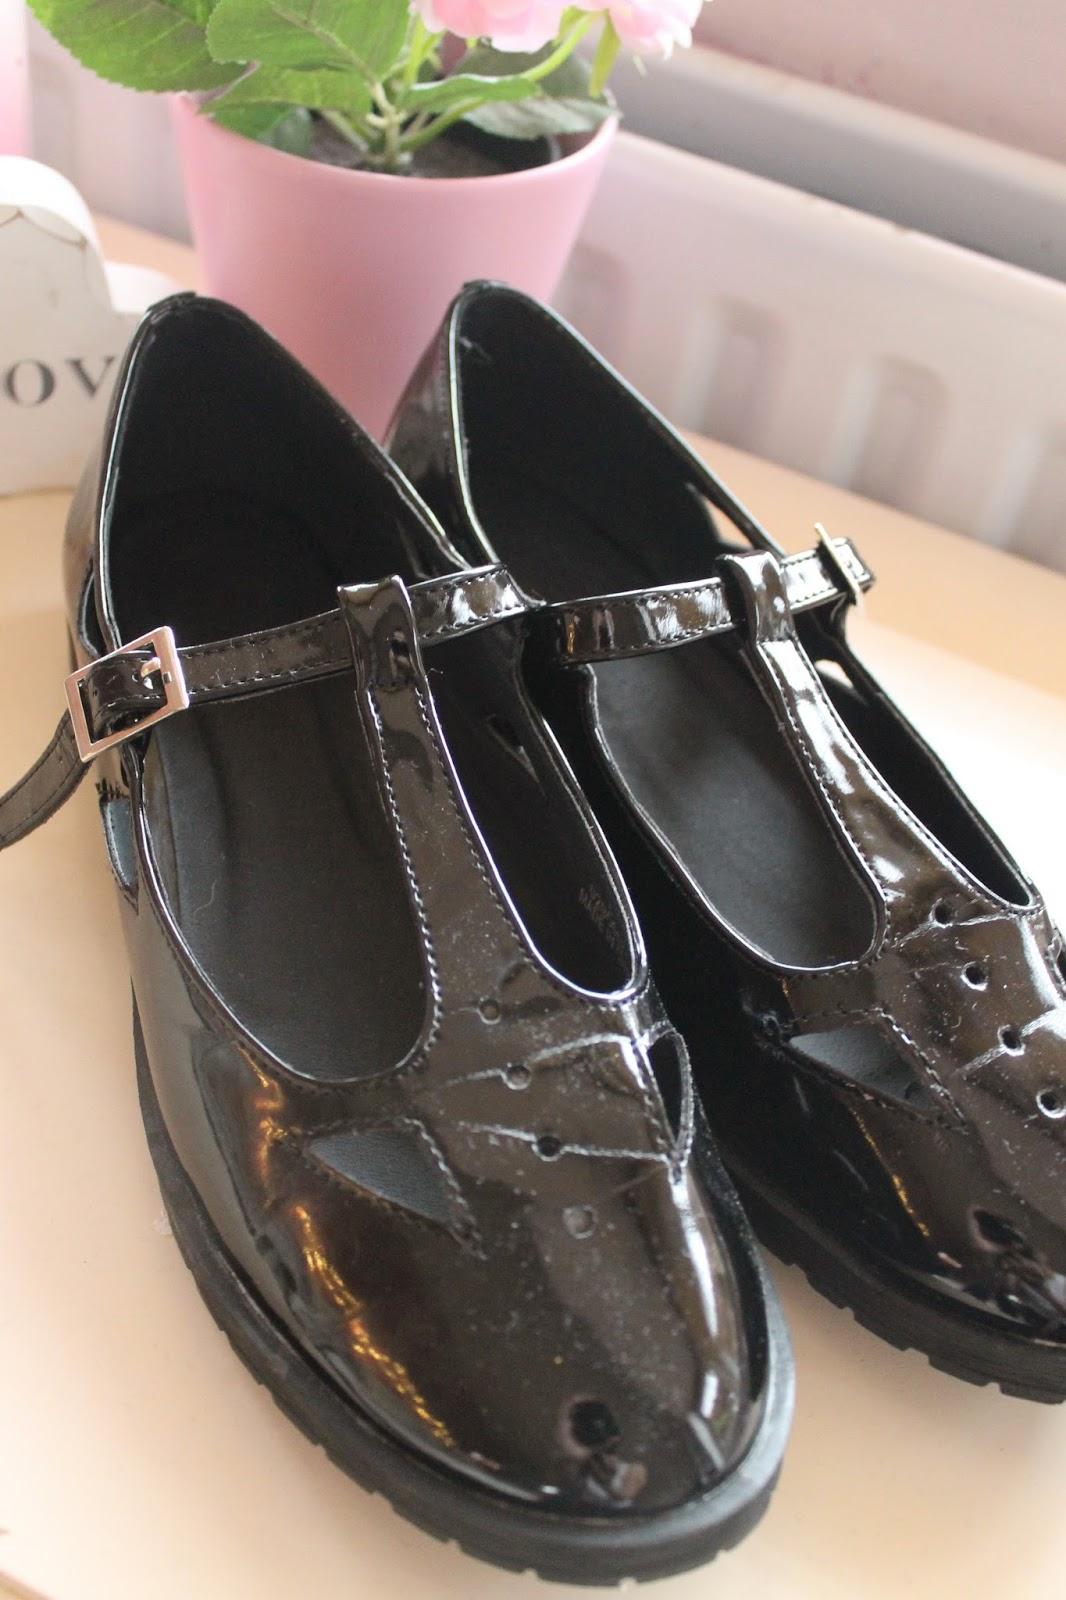 4fac2acb357d ASOS MOLLY T-Bar Flat Shoes - Black patent